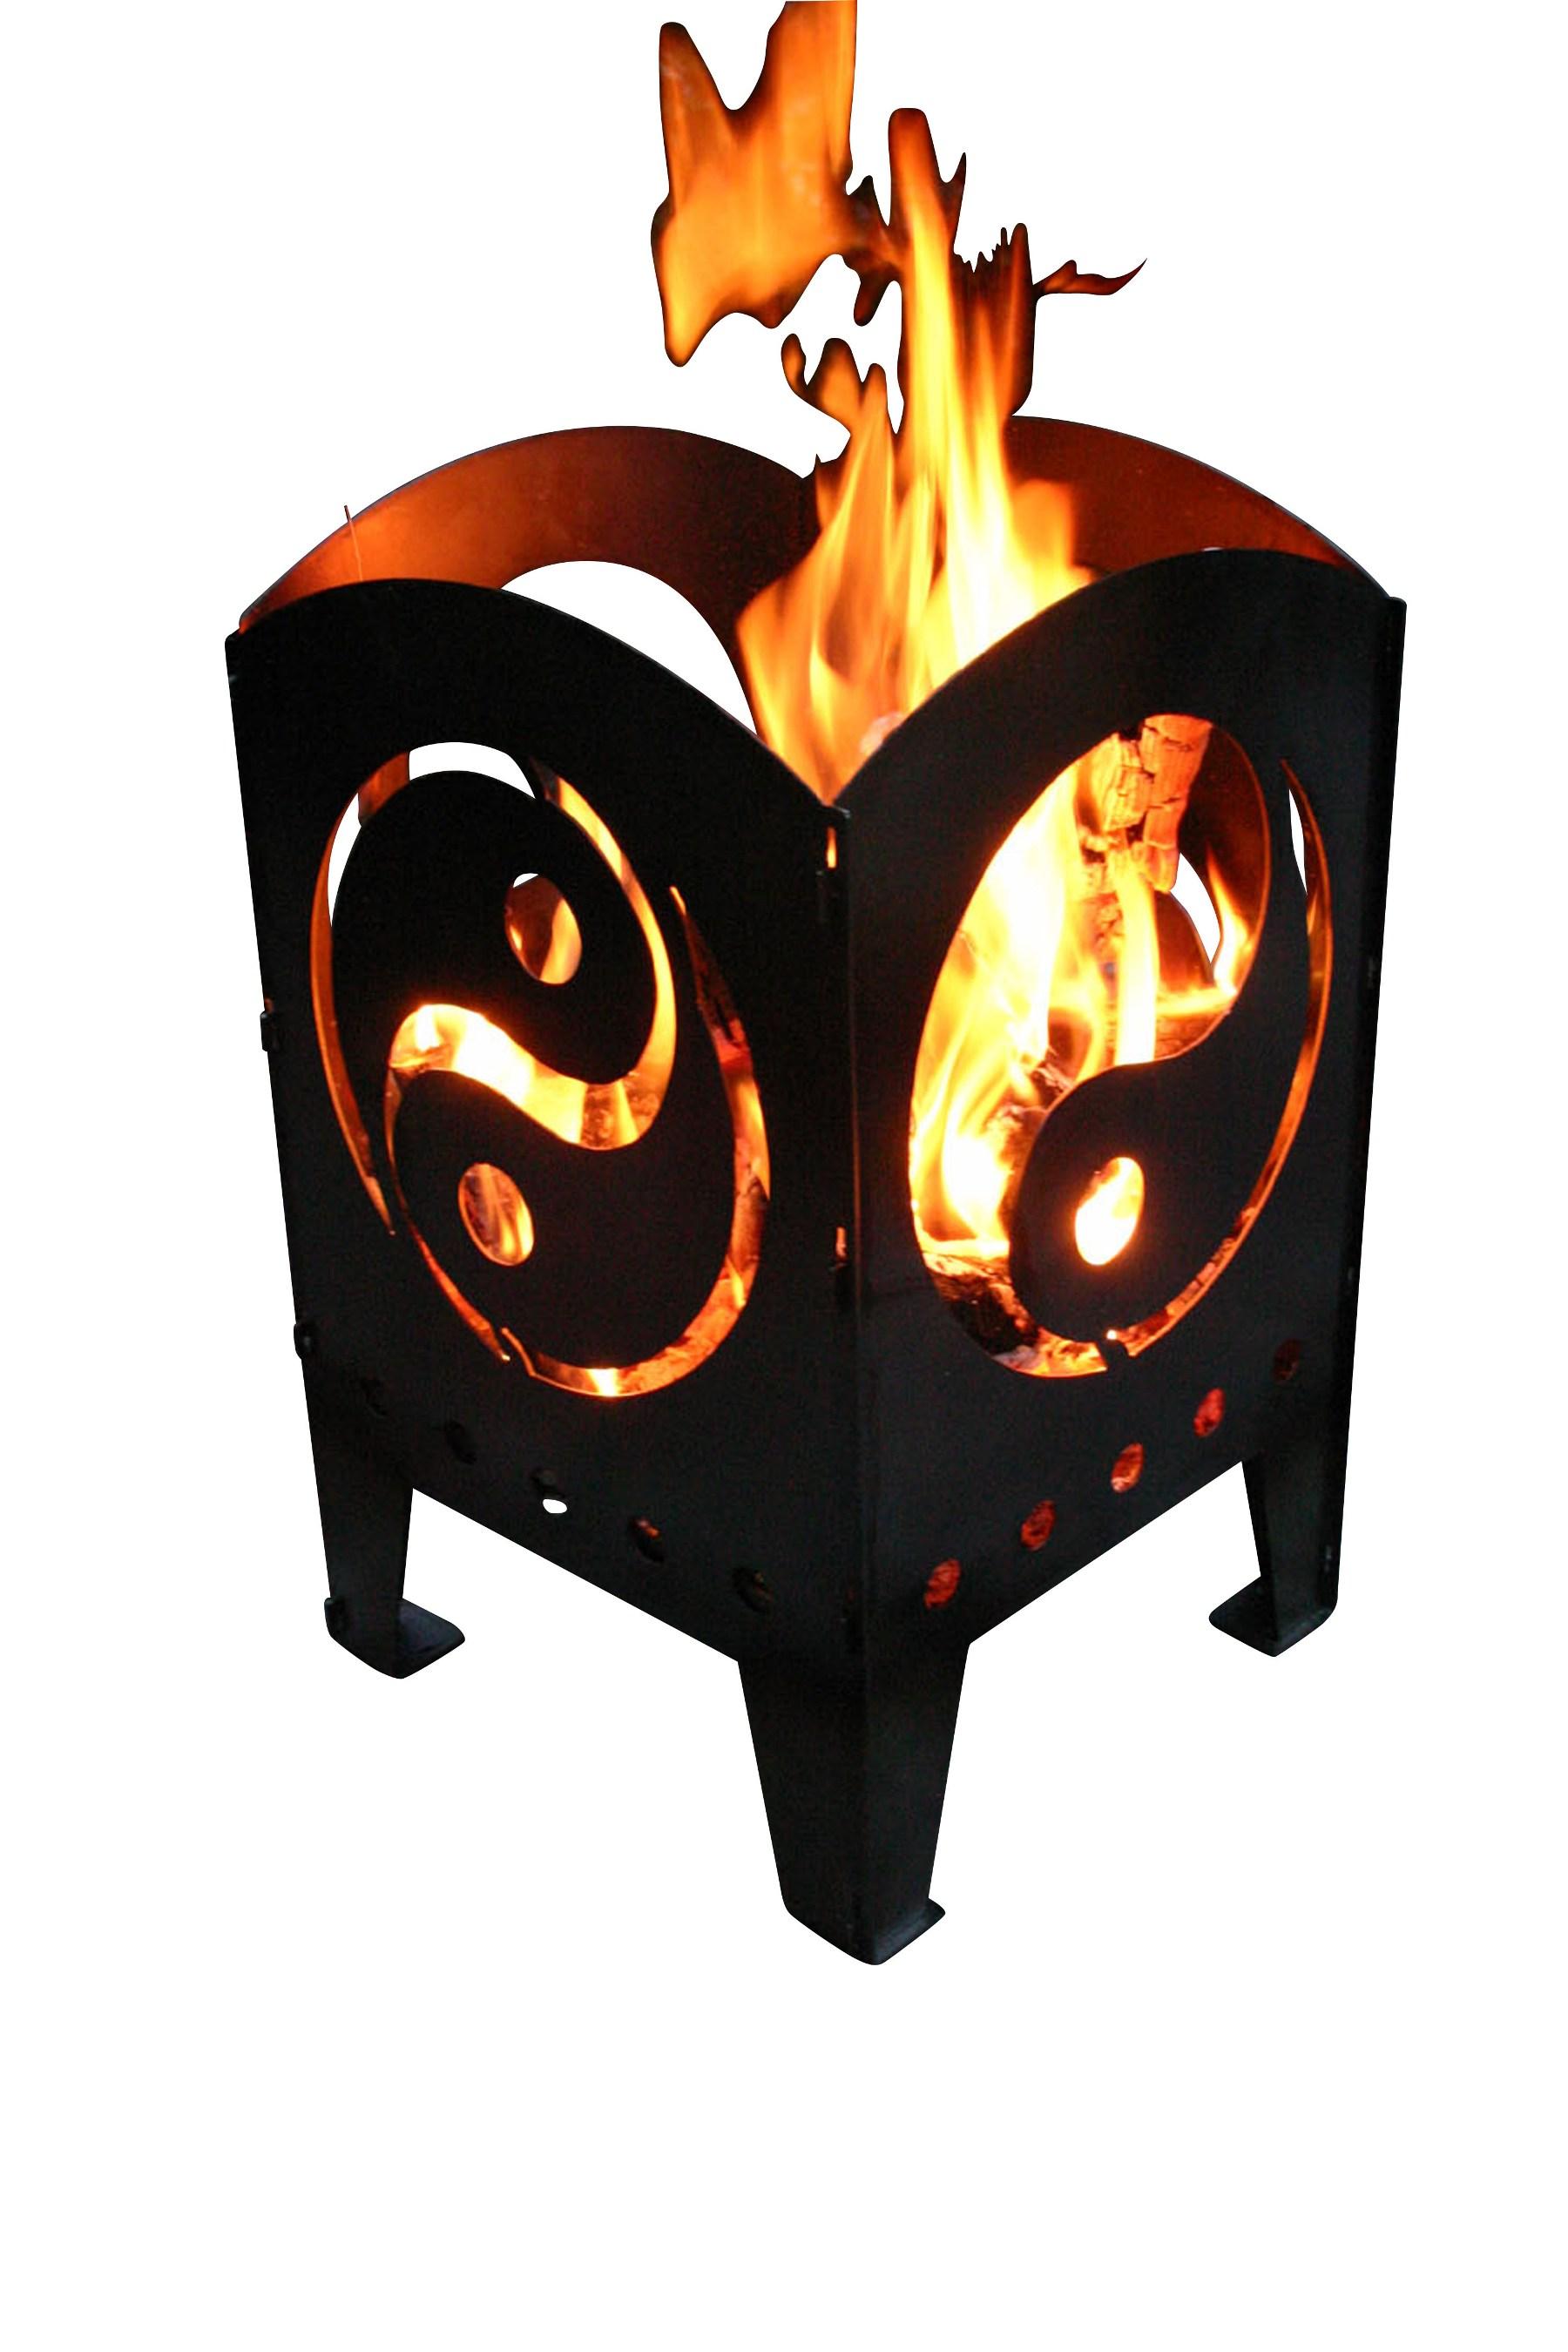 alpenline feuerkorb yin yan in verschiedenen gr en. Black Bedroom Furniture Sets. Home Design Ideas